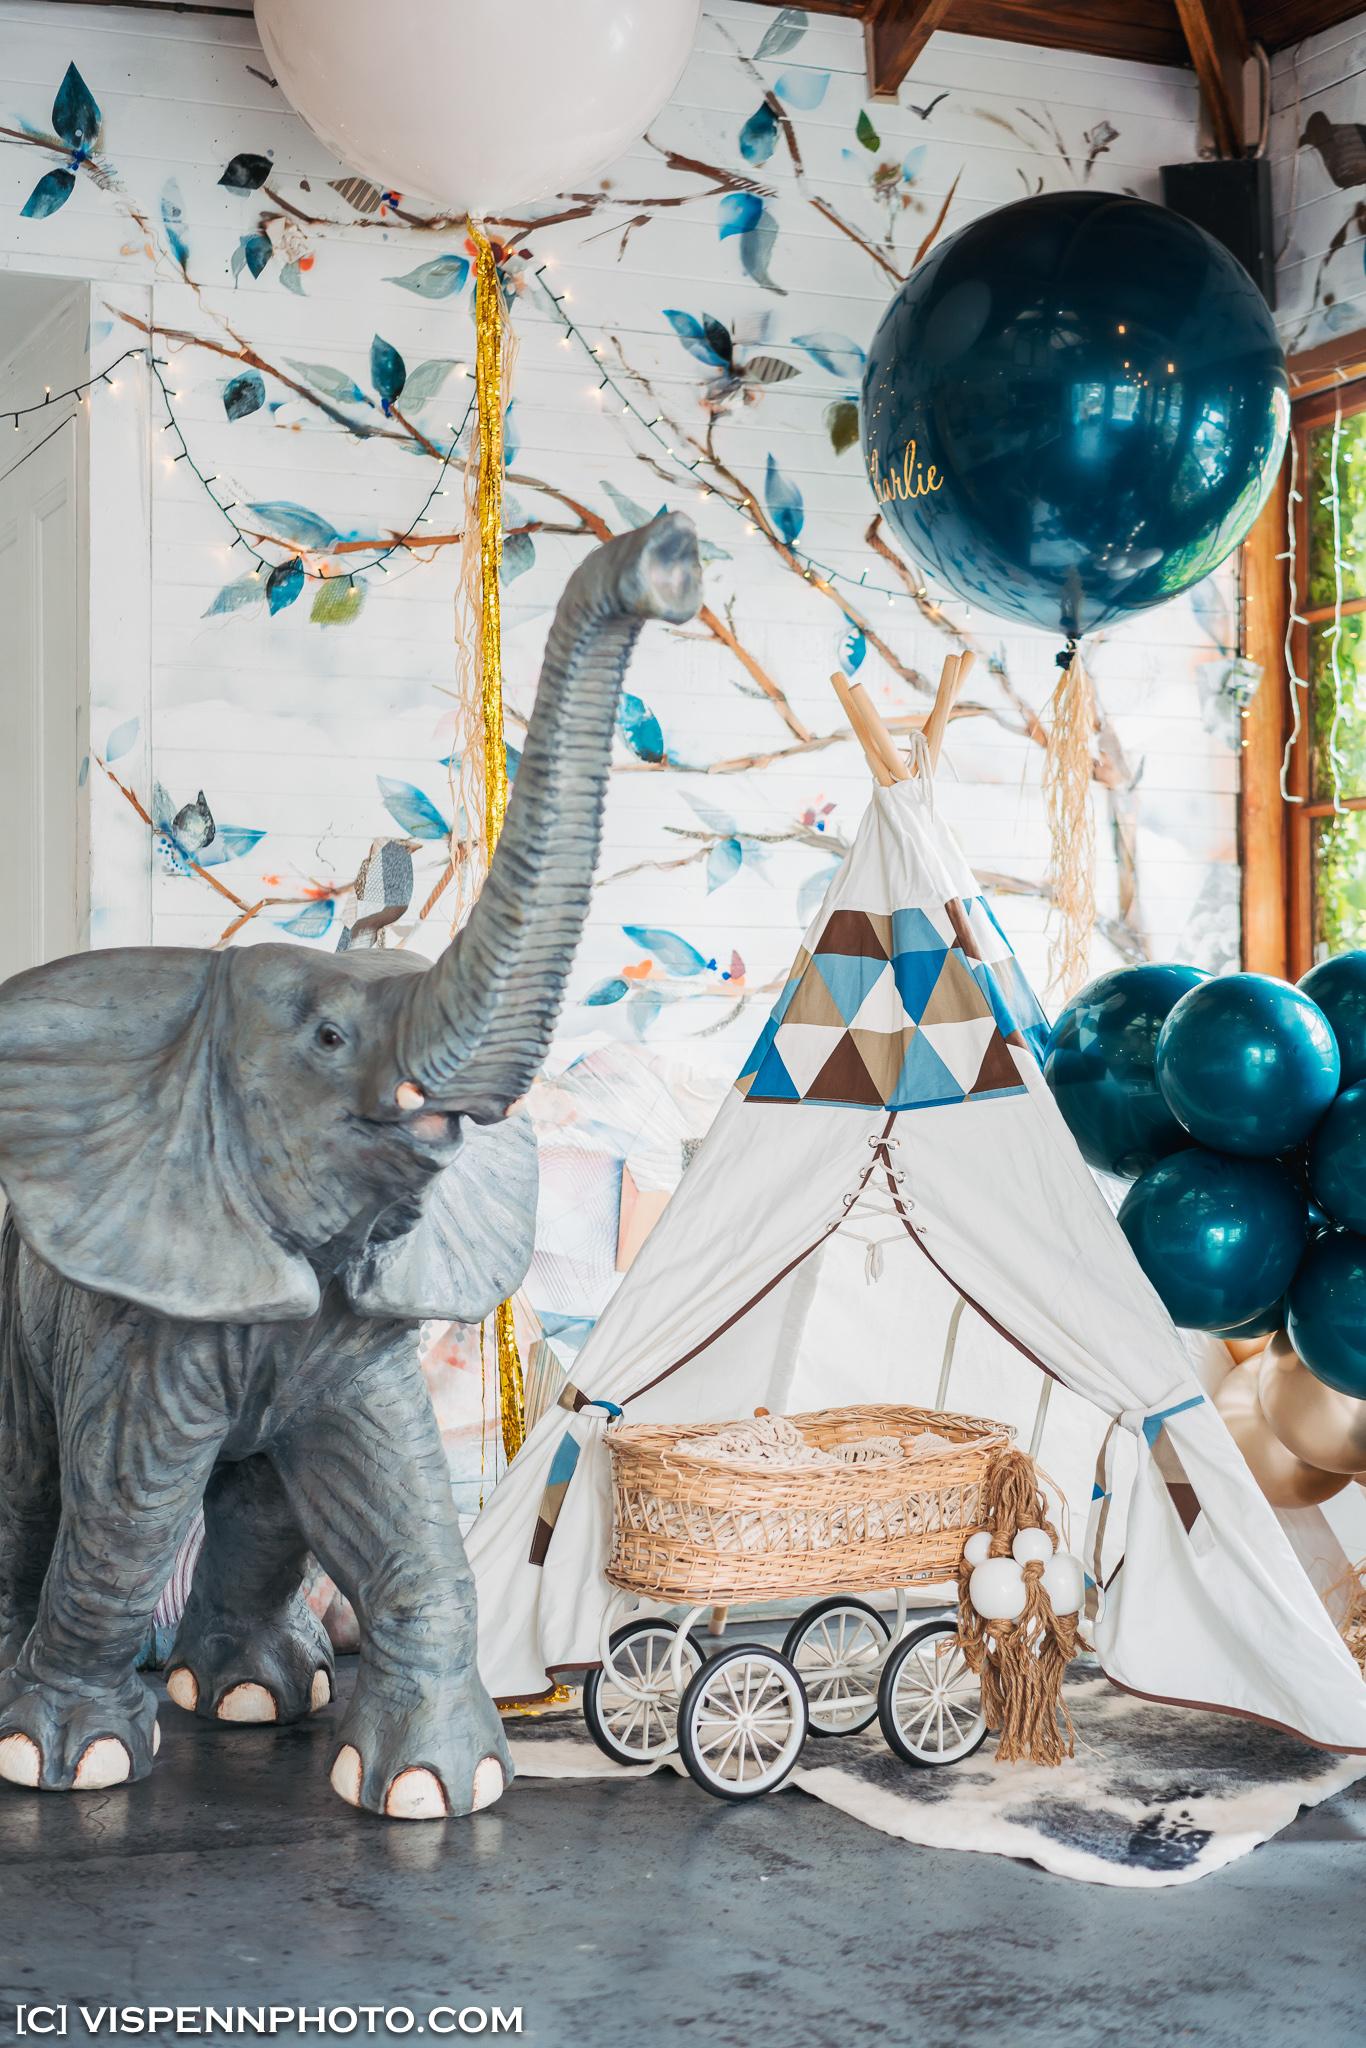 Melbourne Baby Family Birthday Party Photographer 墨尔本 百日宴 满月宴 周岁宴 摄影 VISPENN Charlie 0059 Sony VISPENN